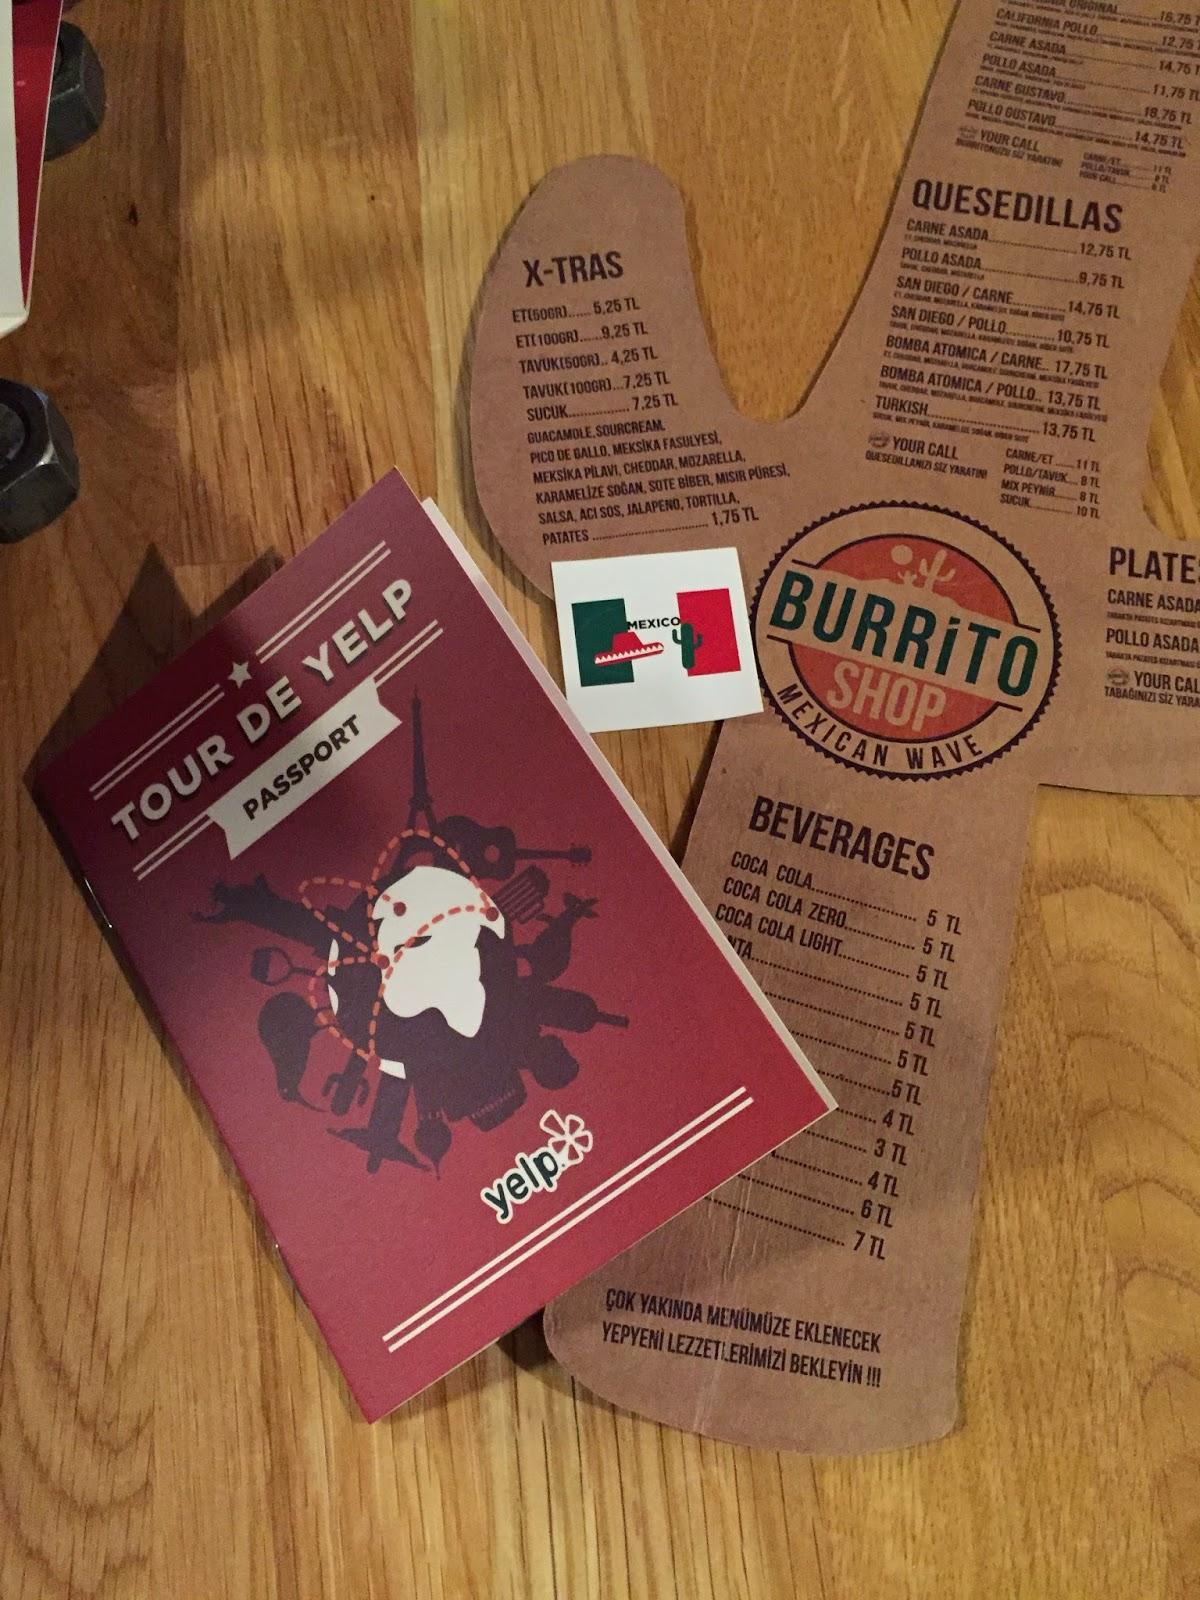 Yelp kesif - Burrito shop - meksika yemegi